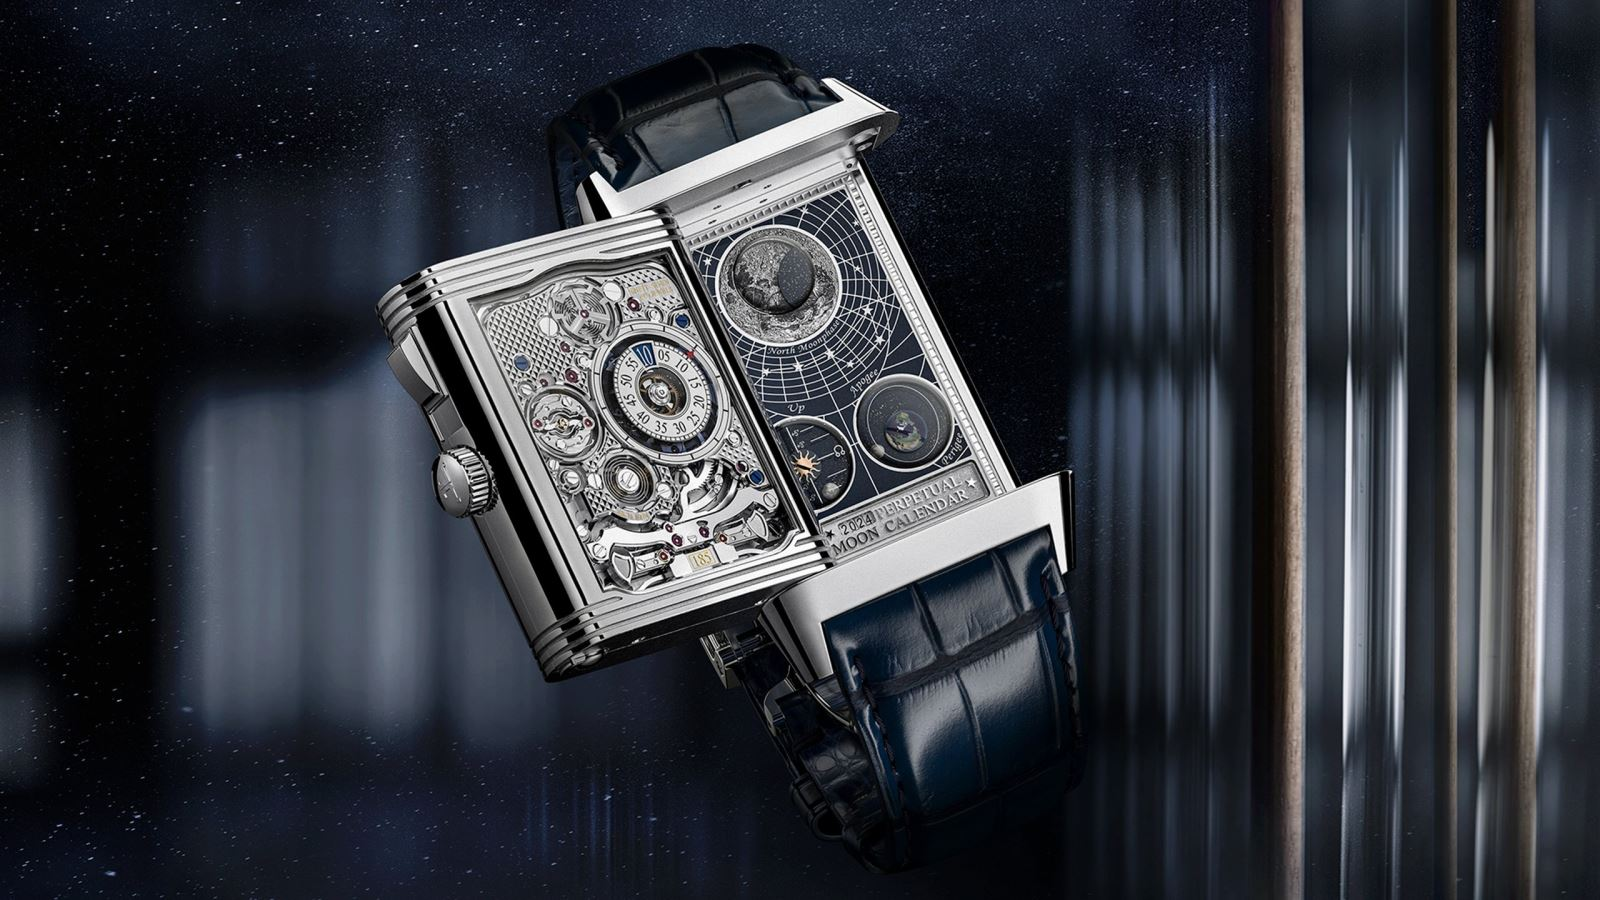 đồng hồ Jaeger-LeCoultre Reverso Hybris Mechanica Calibre 185 Quadriptyque